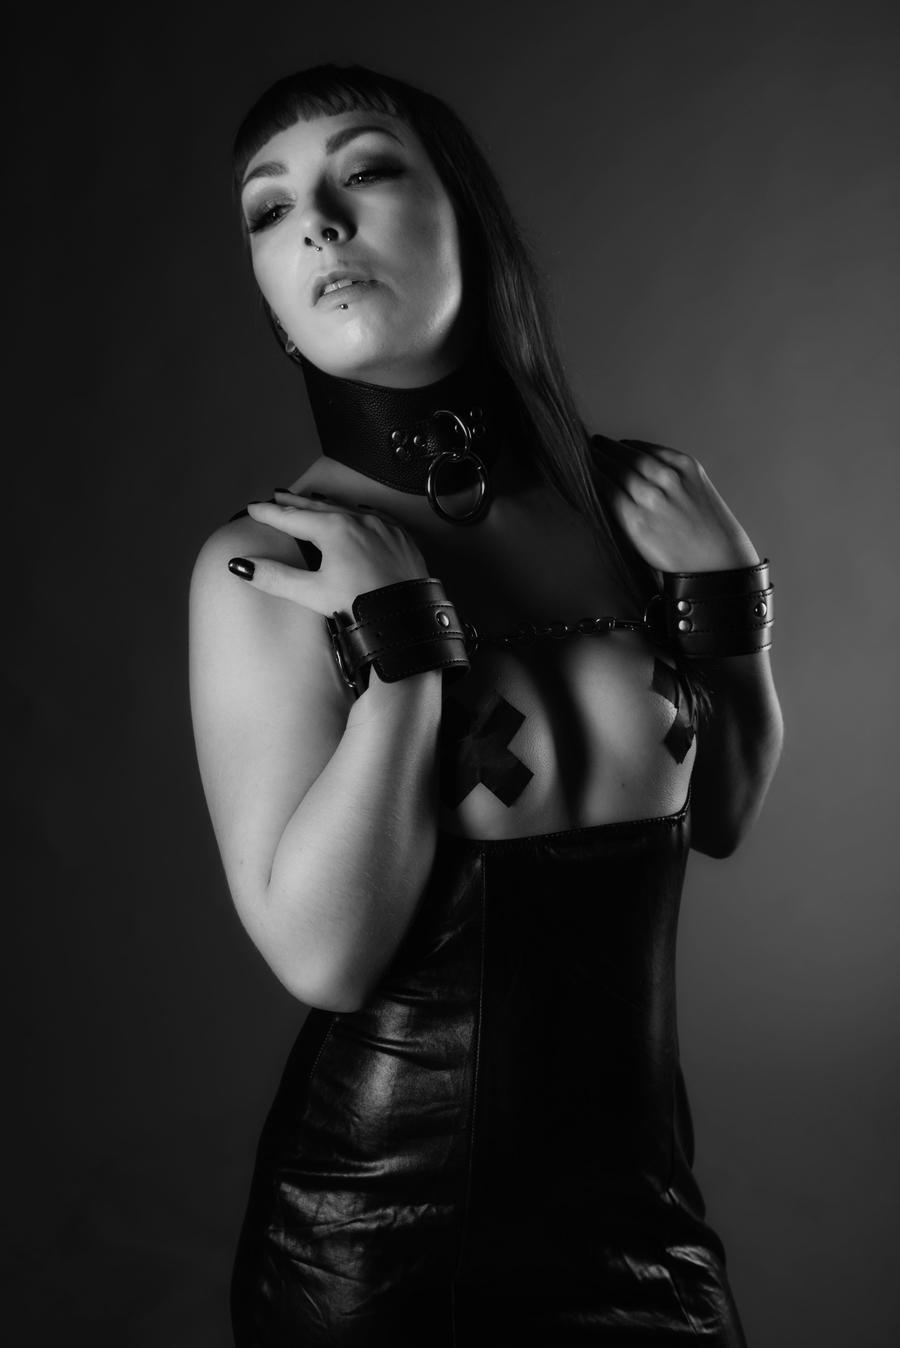 Photography by Roger M, Model Spellbound, Taken at Roger M / Uploaded 3rd September 2021 @ 04:54 PM